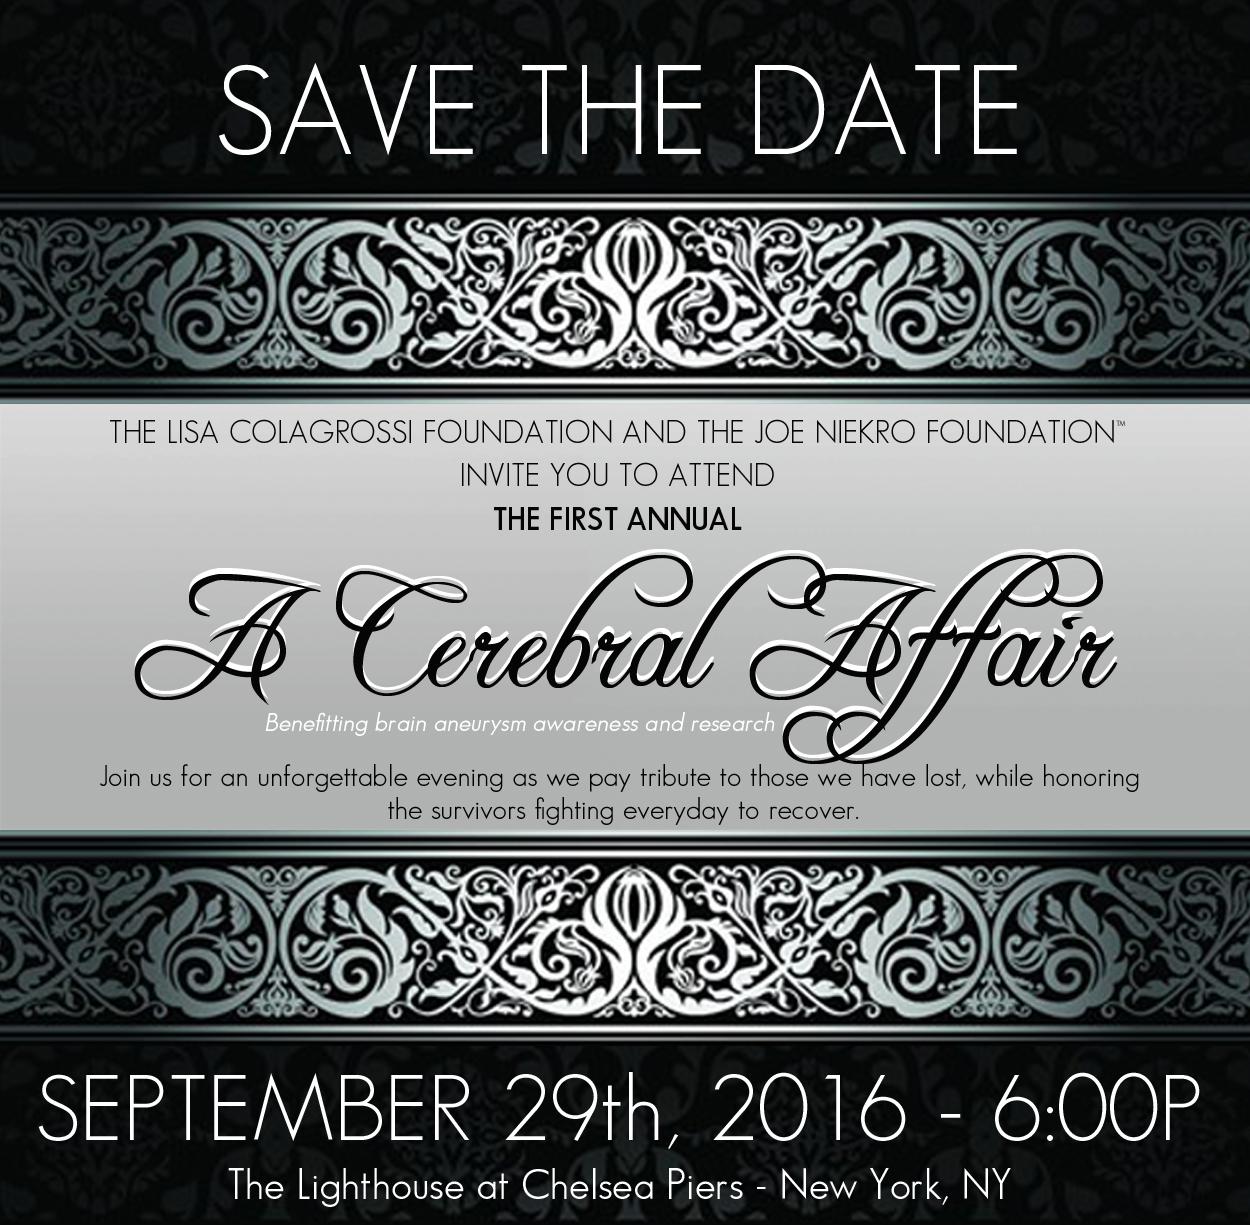 https://www.joeniekrofoundation.com/events/past-events/pastevents2016/a-cerebral-affair/attachment/black-and-silver4/